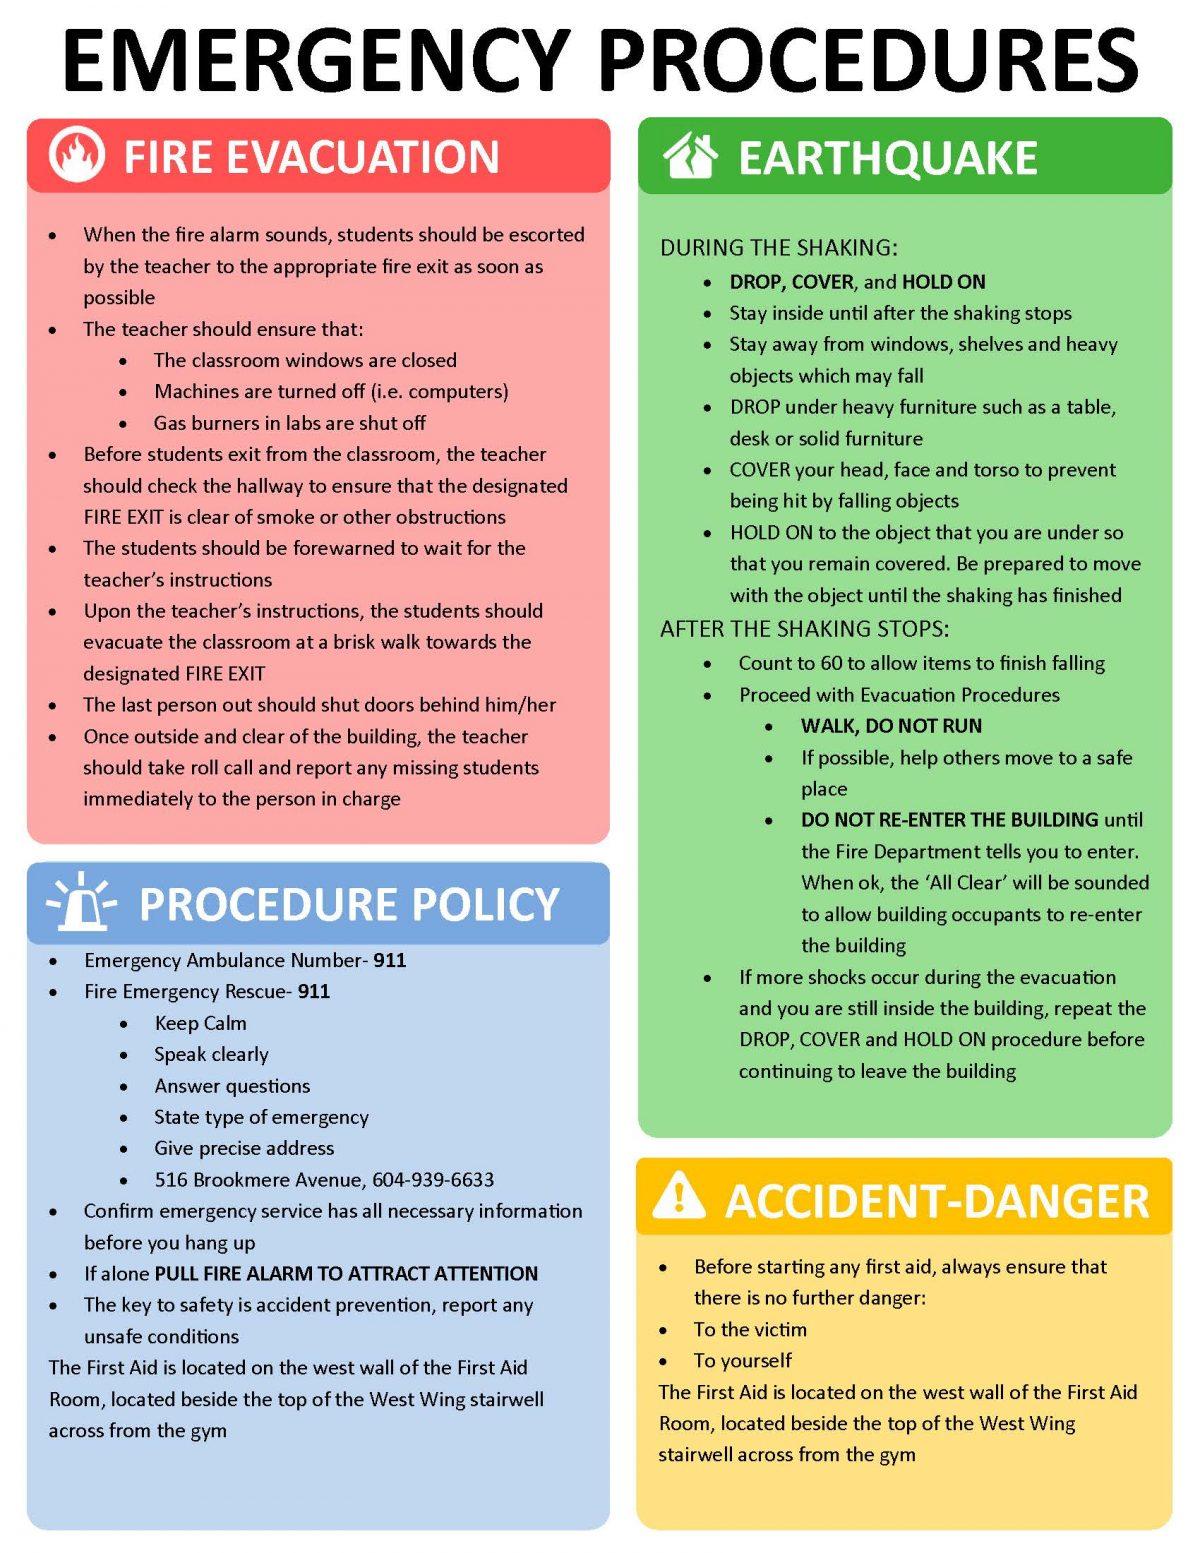 Fire & Earthquake Procedures